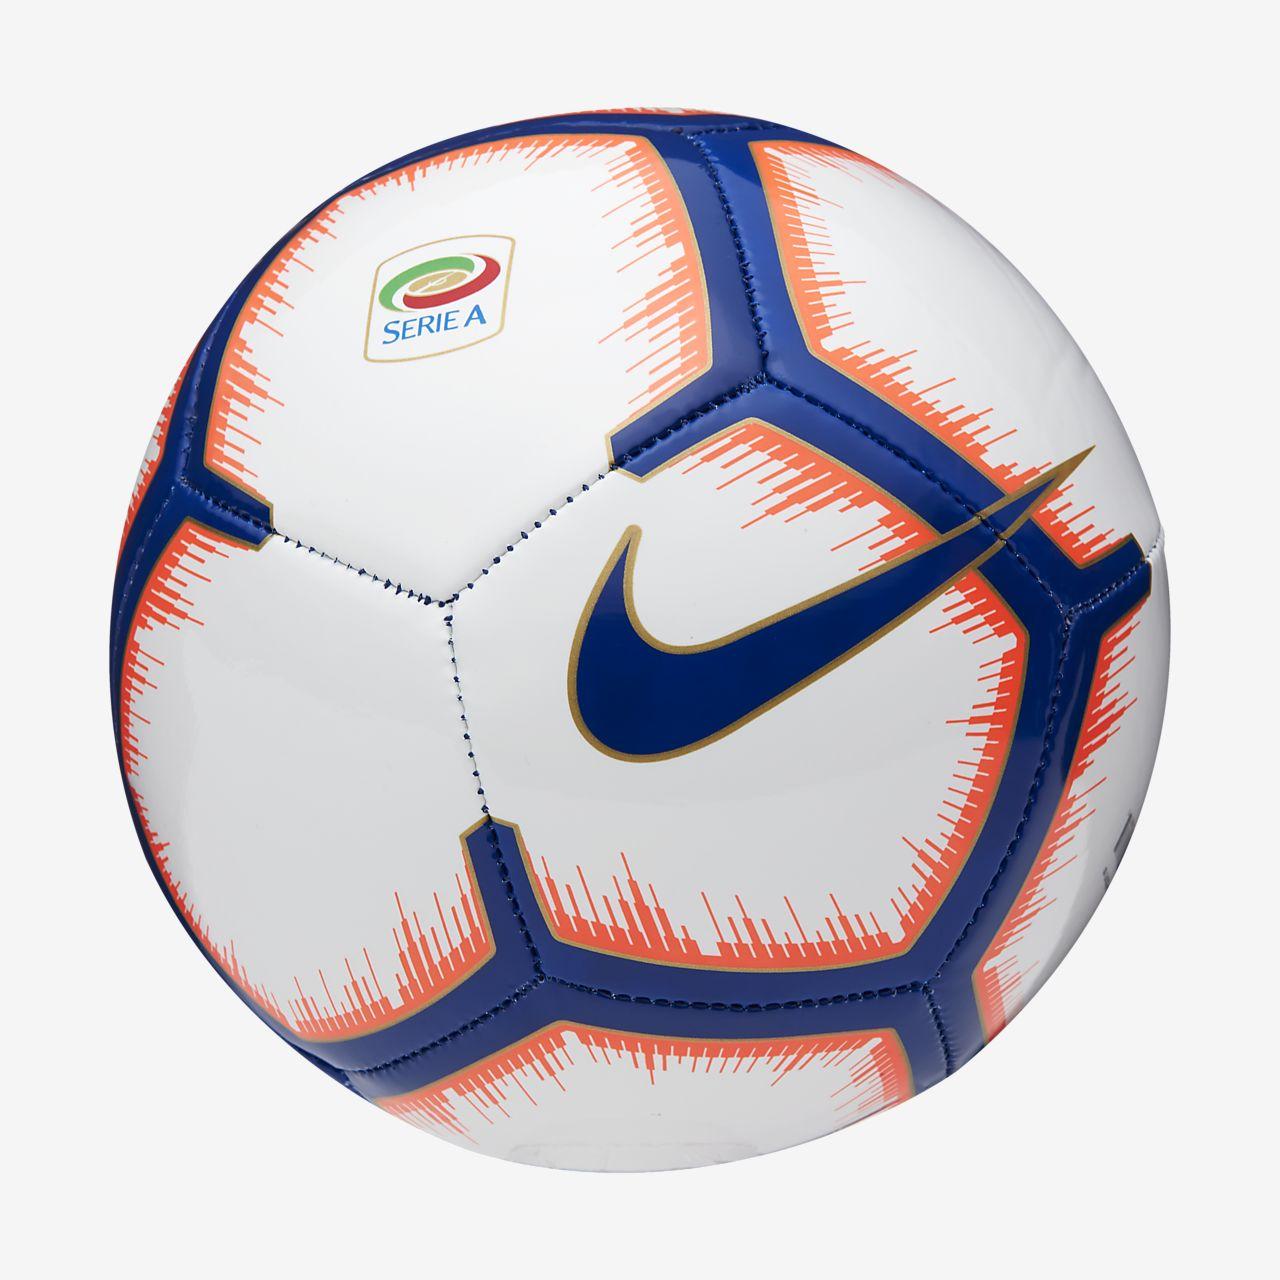 Футбольный мяч Serie A Skills